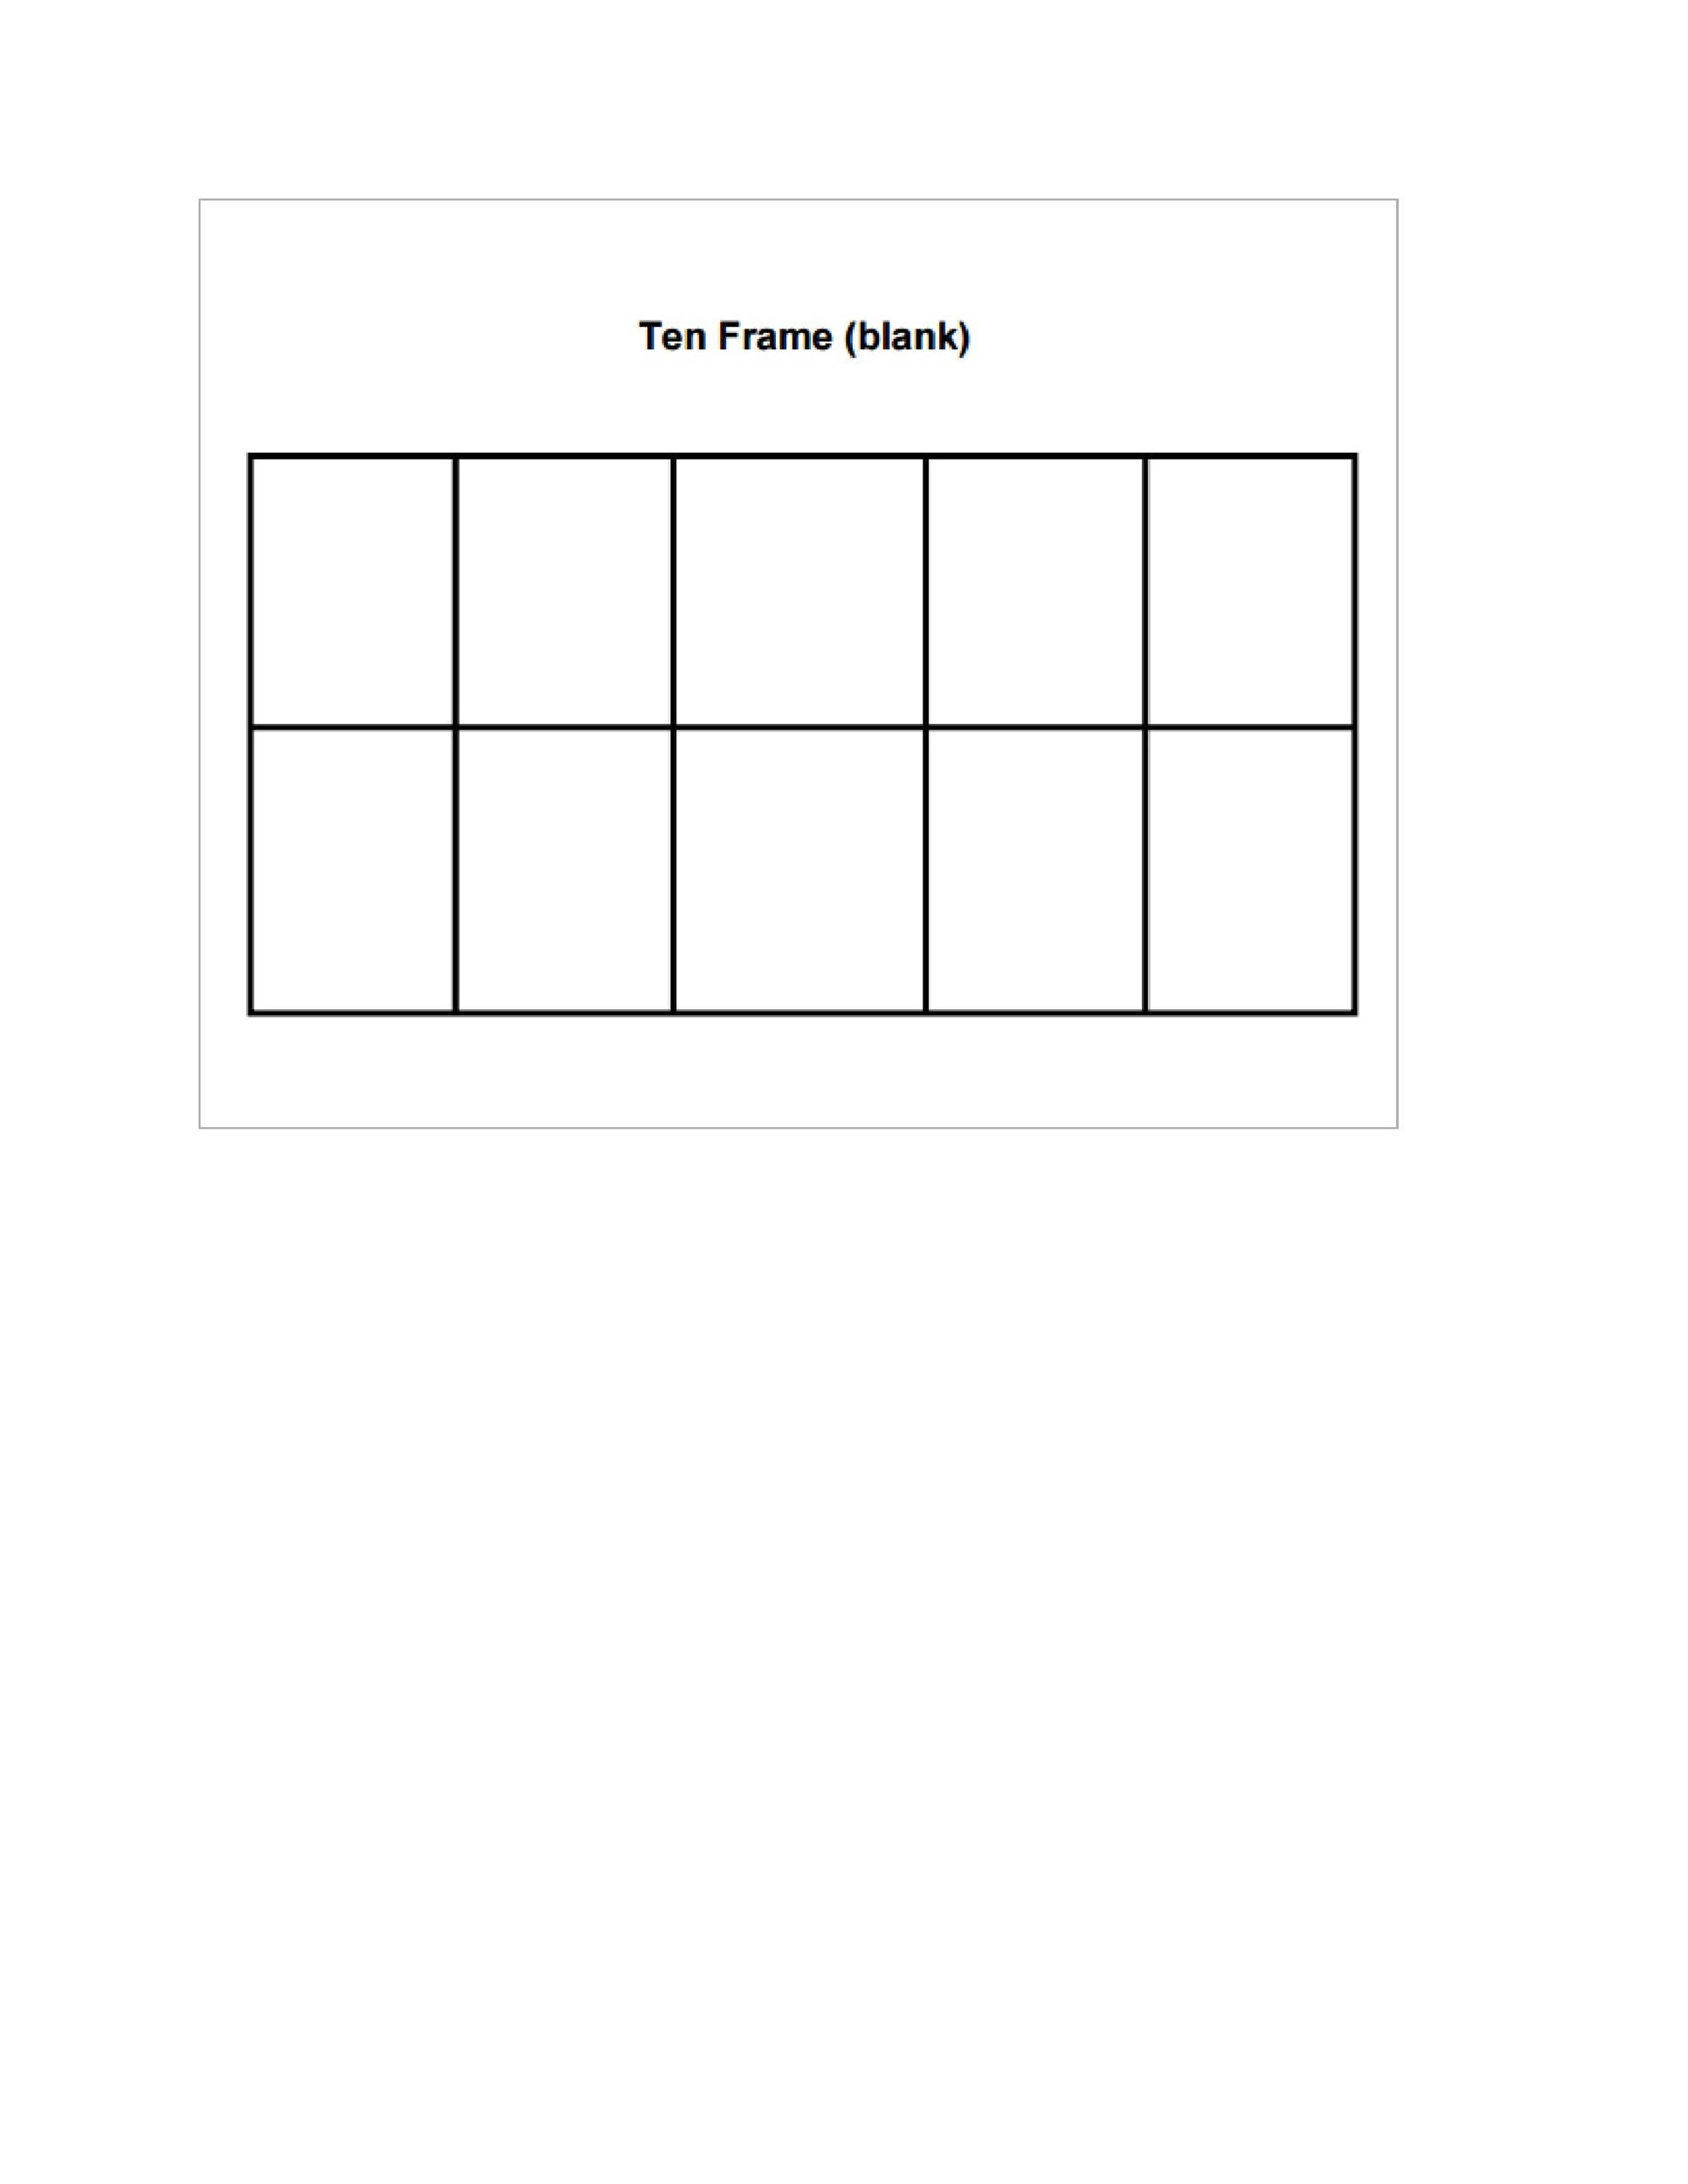 Ten Frame Template For Kindergarten